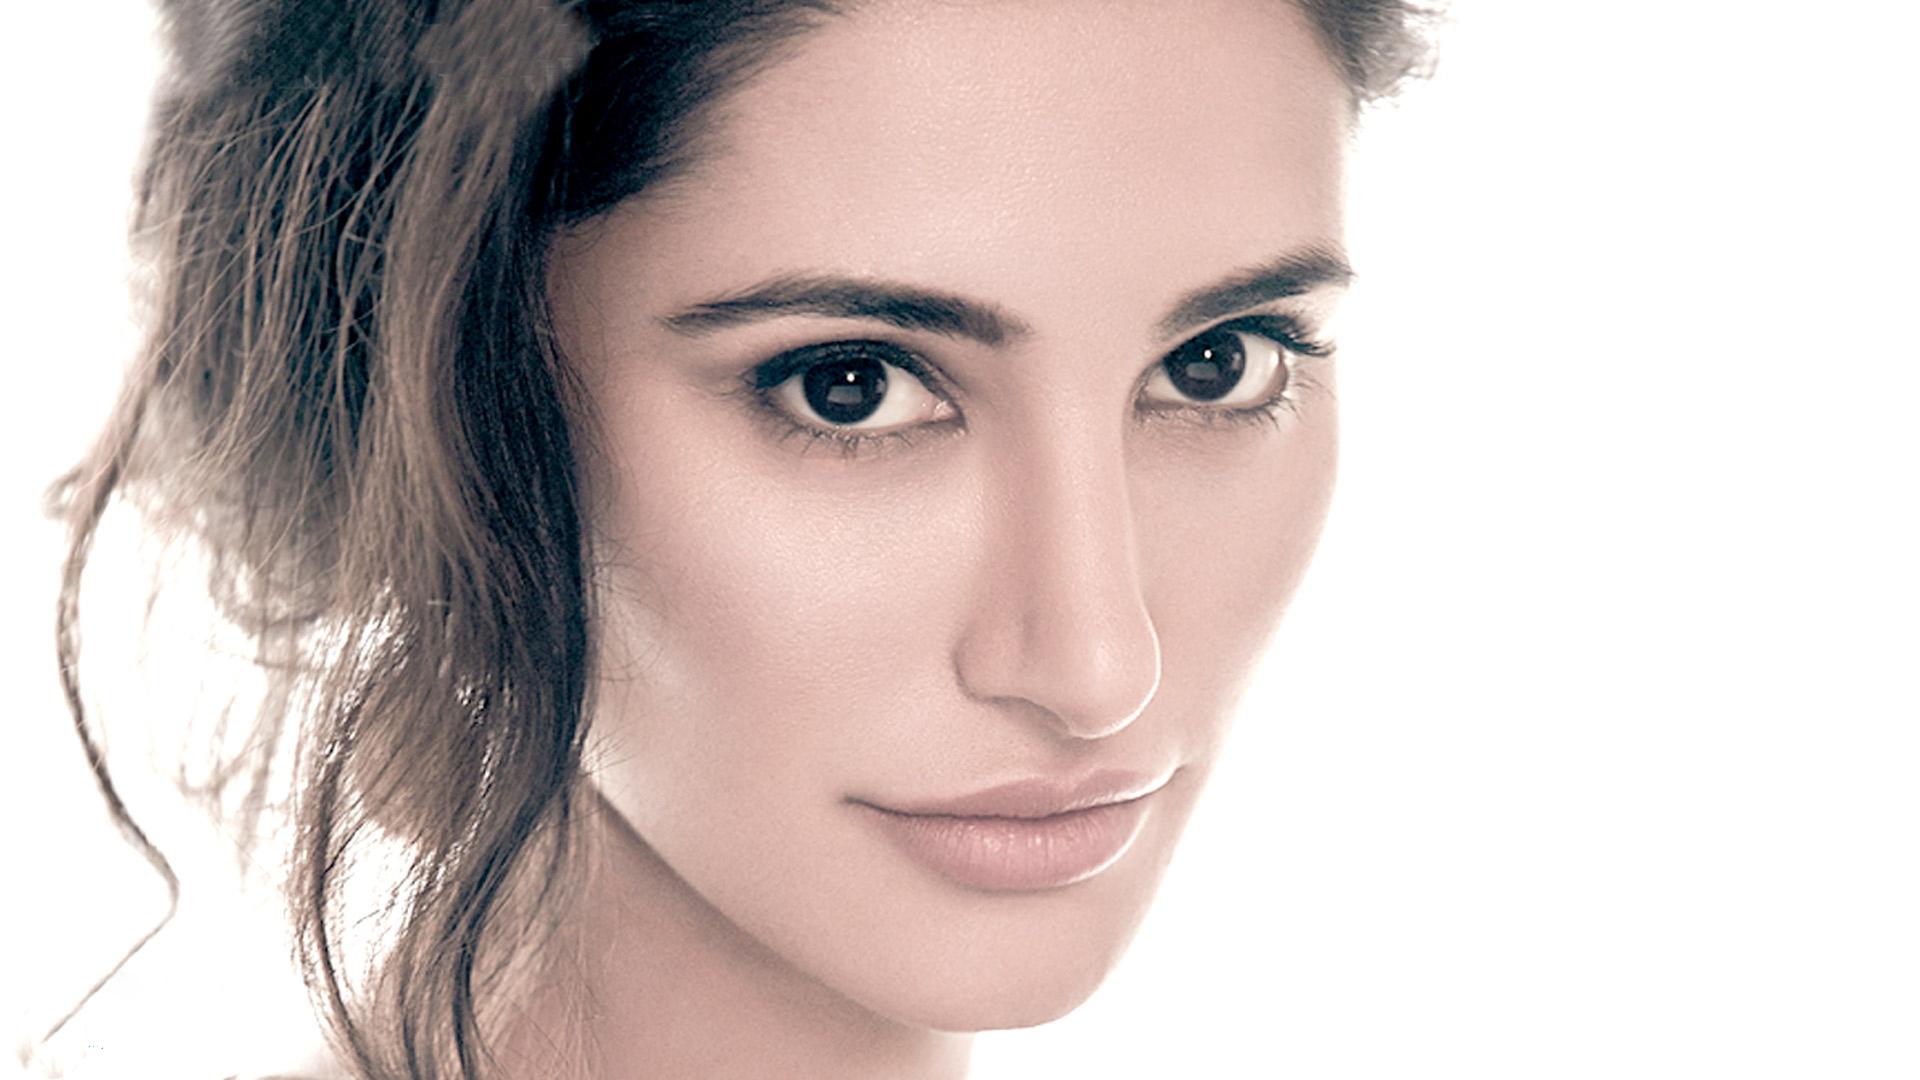 Celebrities Hd Wallpaper Download Nargis Fakhri Hd: Nargis Fakhri New HD Close Up Wallpapers Wallpaper, HD